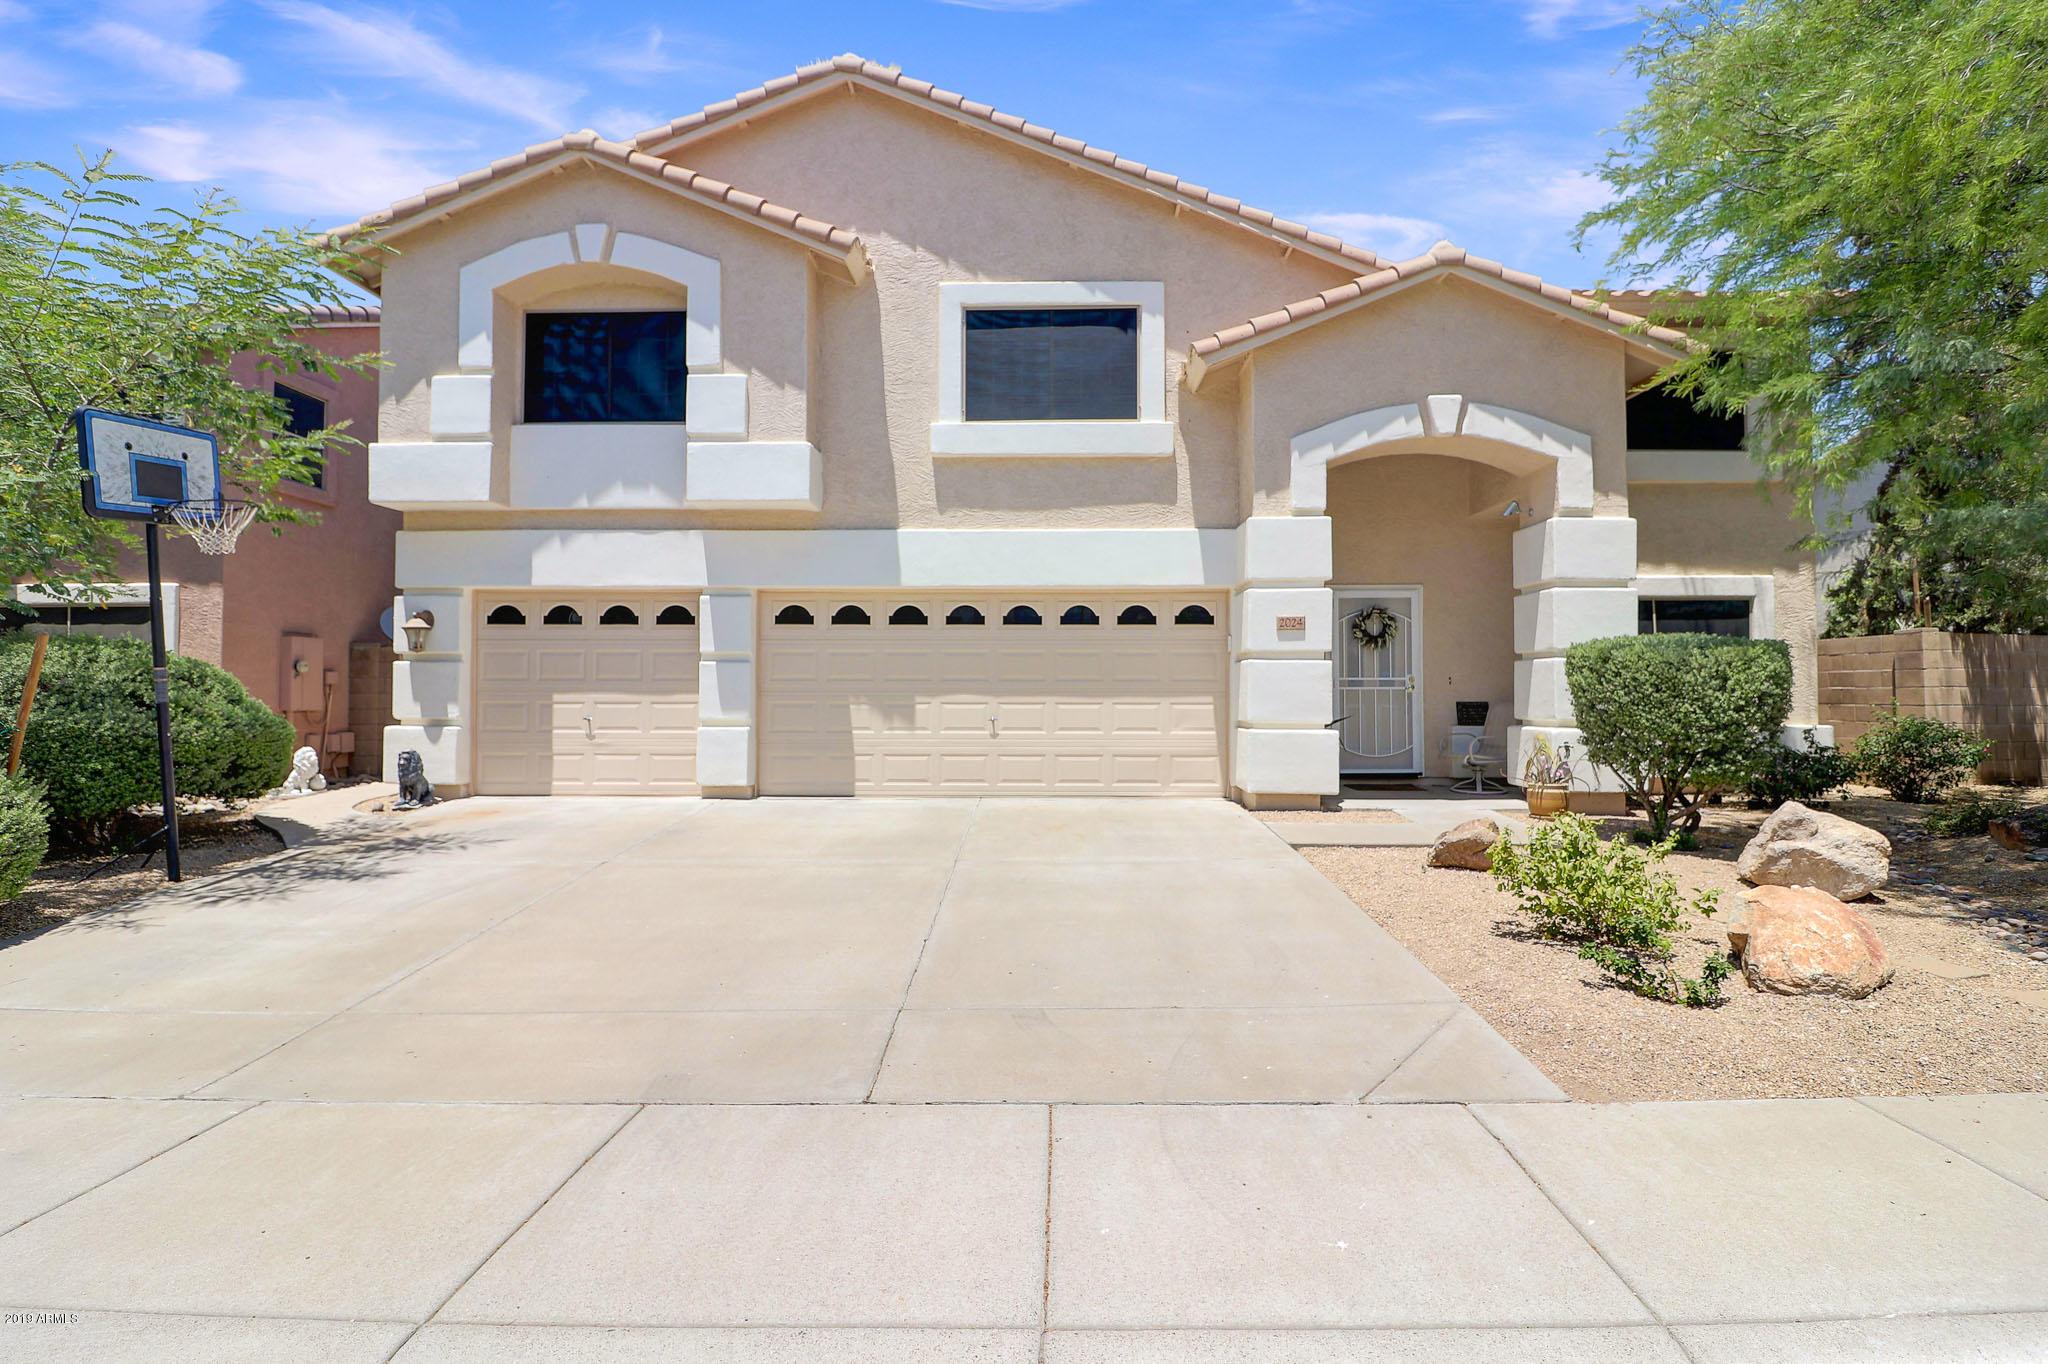 Photo for 2024 E Soft Wind Drive, Phoenix, AZ 85024 (MLS # 5938730)